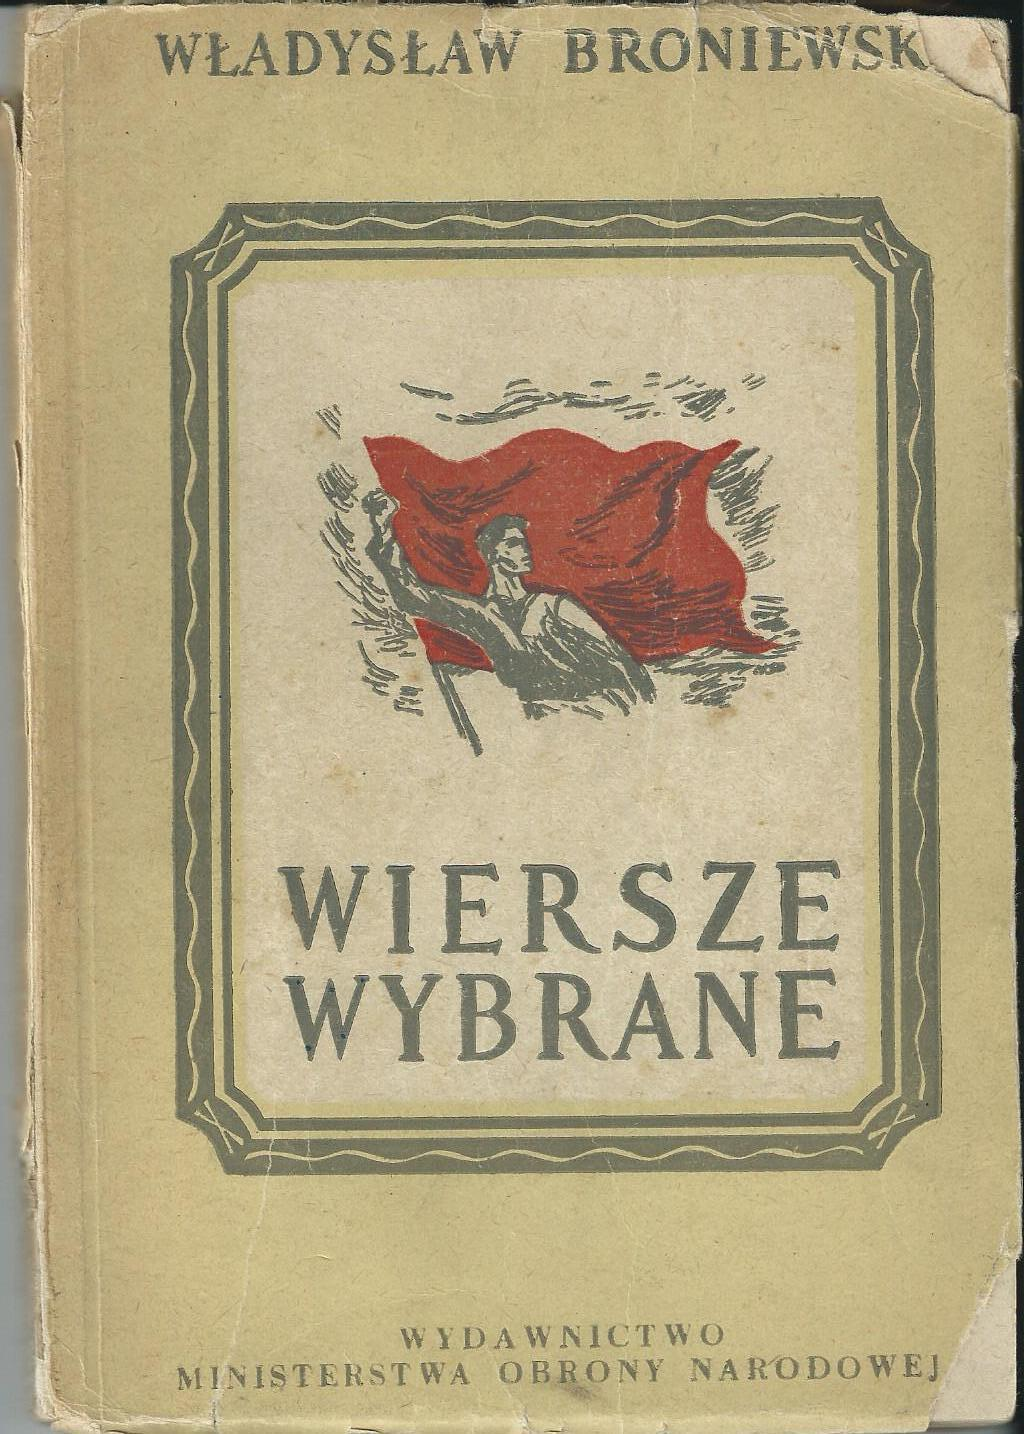 Historia I Ja Mój Broniewski